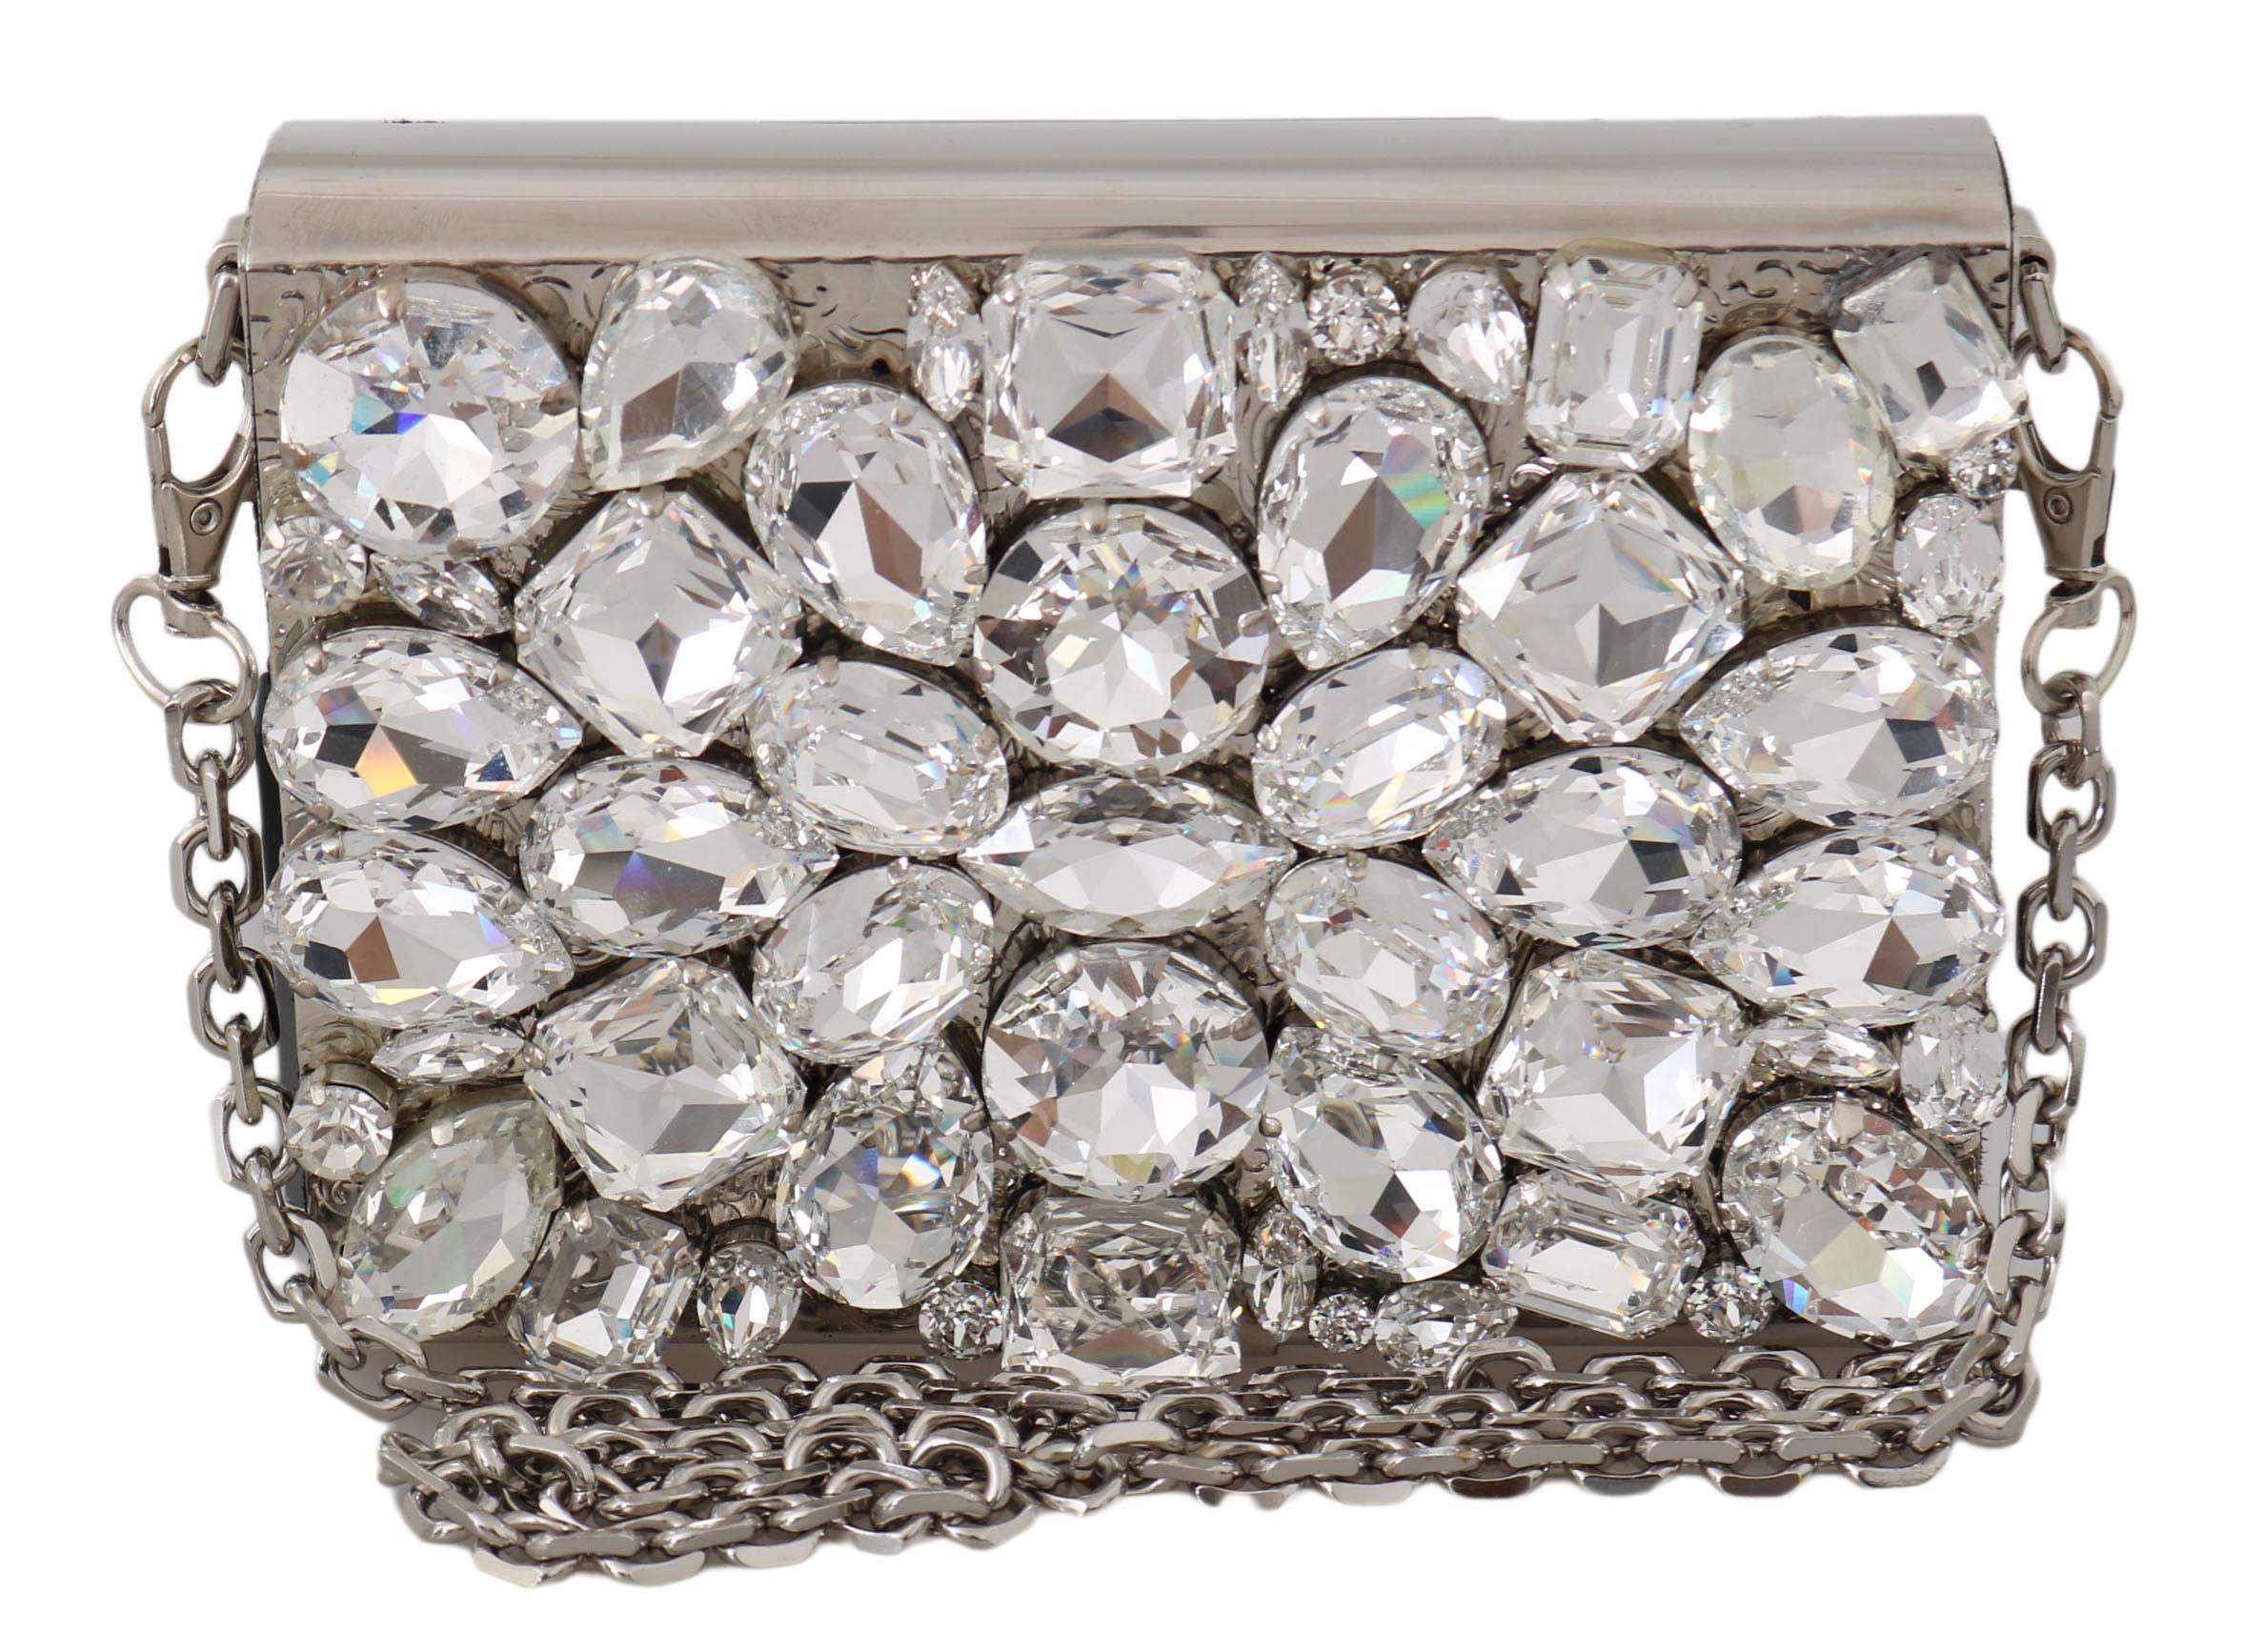 Dolce & Gabbana Women's Metal Crystal Shoulder Bag Silver VA1135